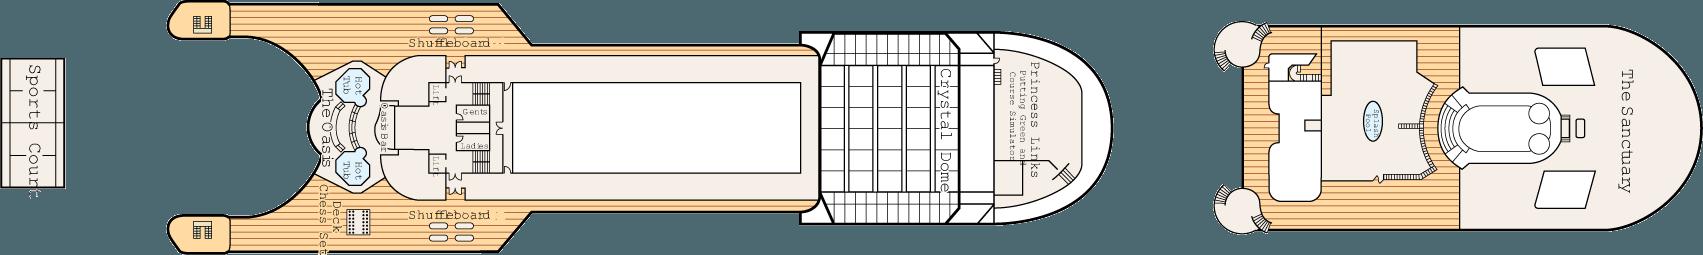 Deck 16-17